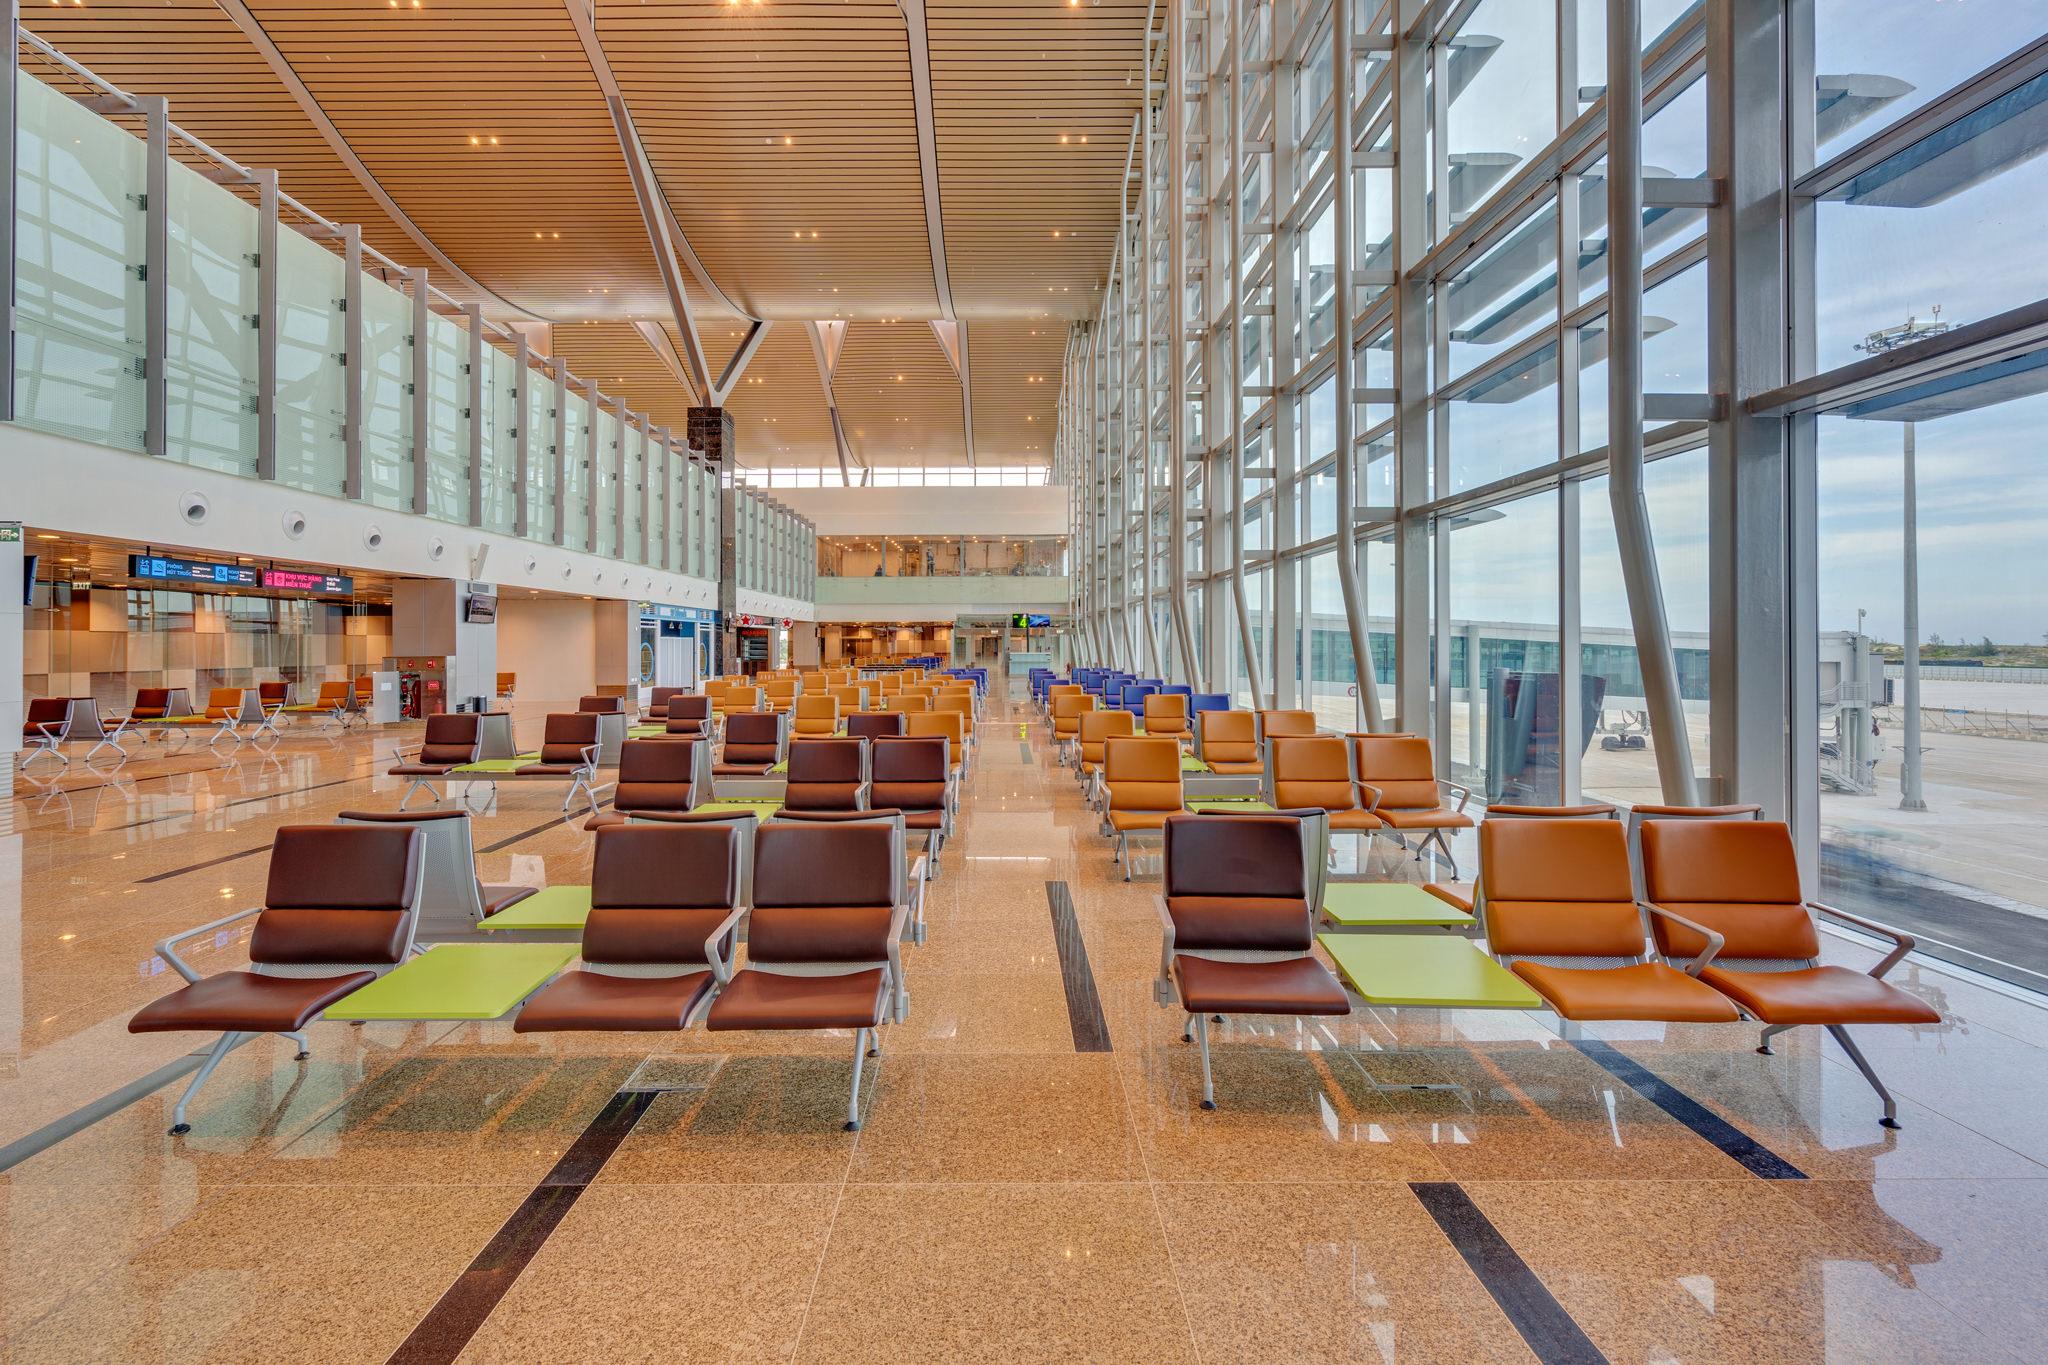 20180626 - Cam Ranh Airport - Architecture - 0354.jpg